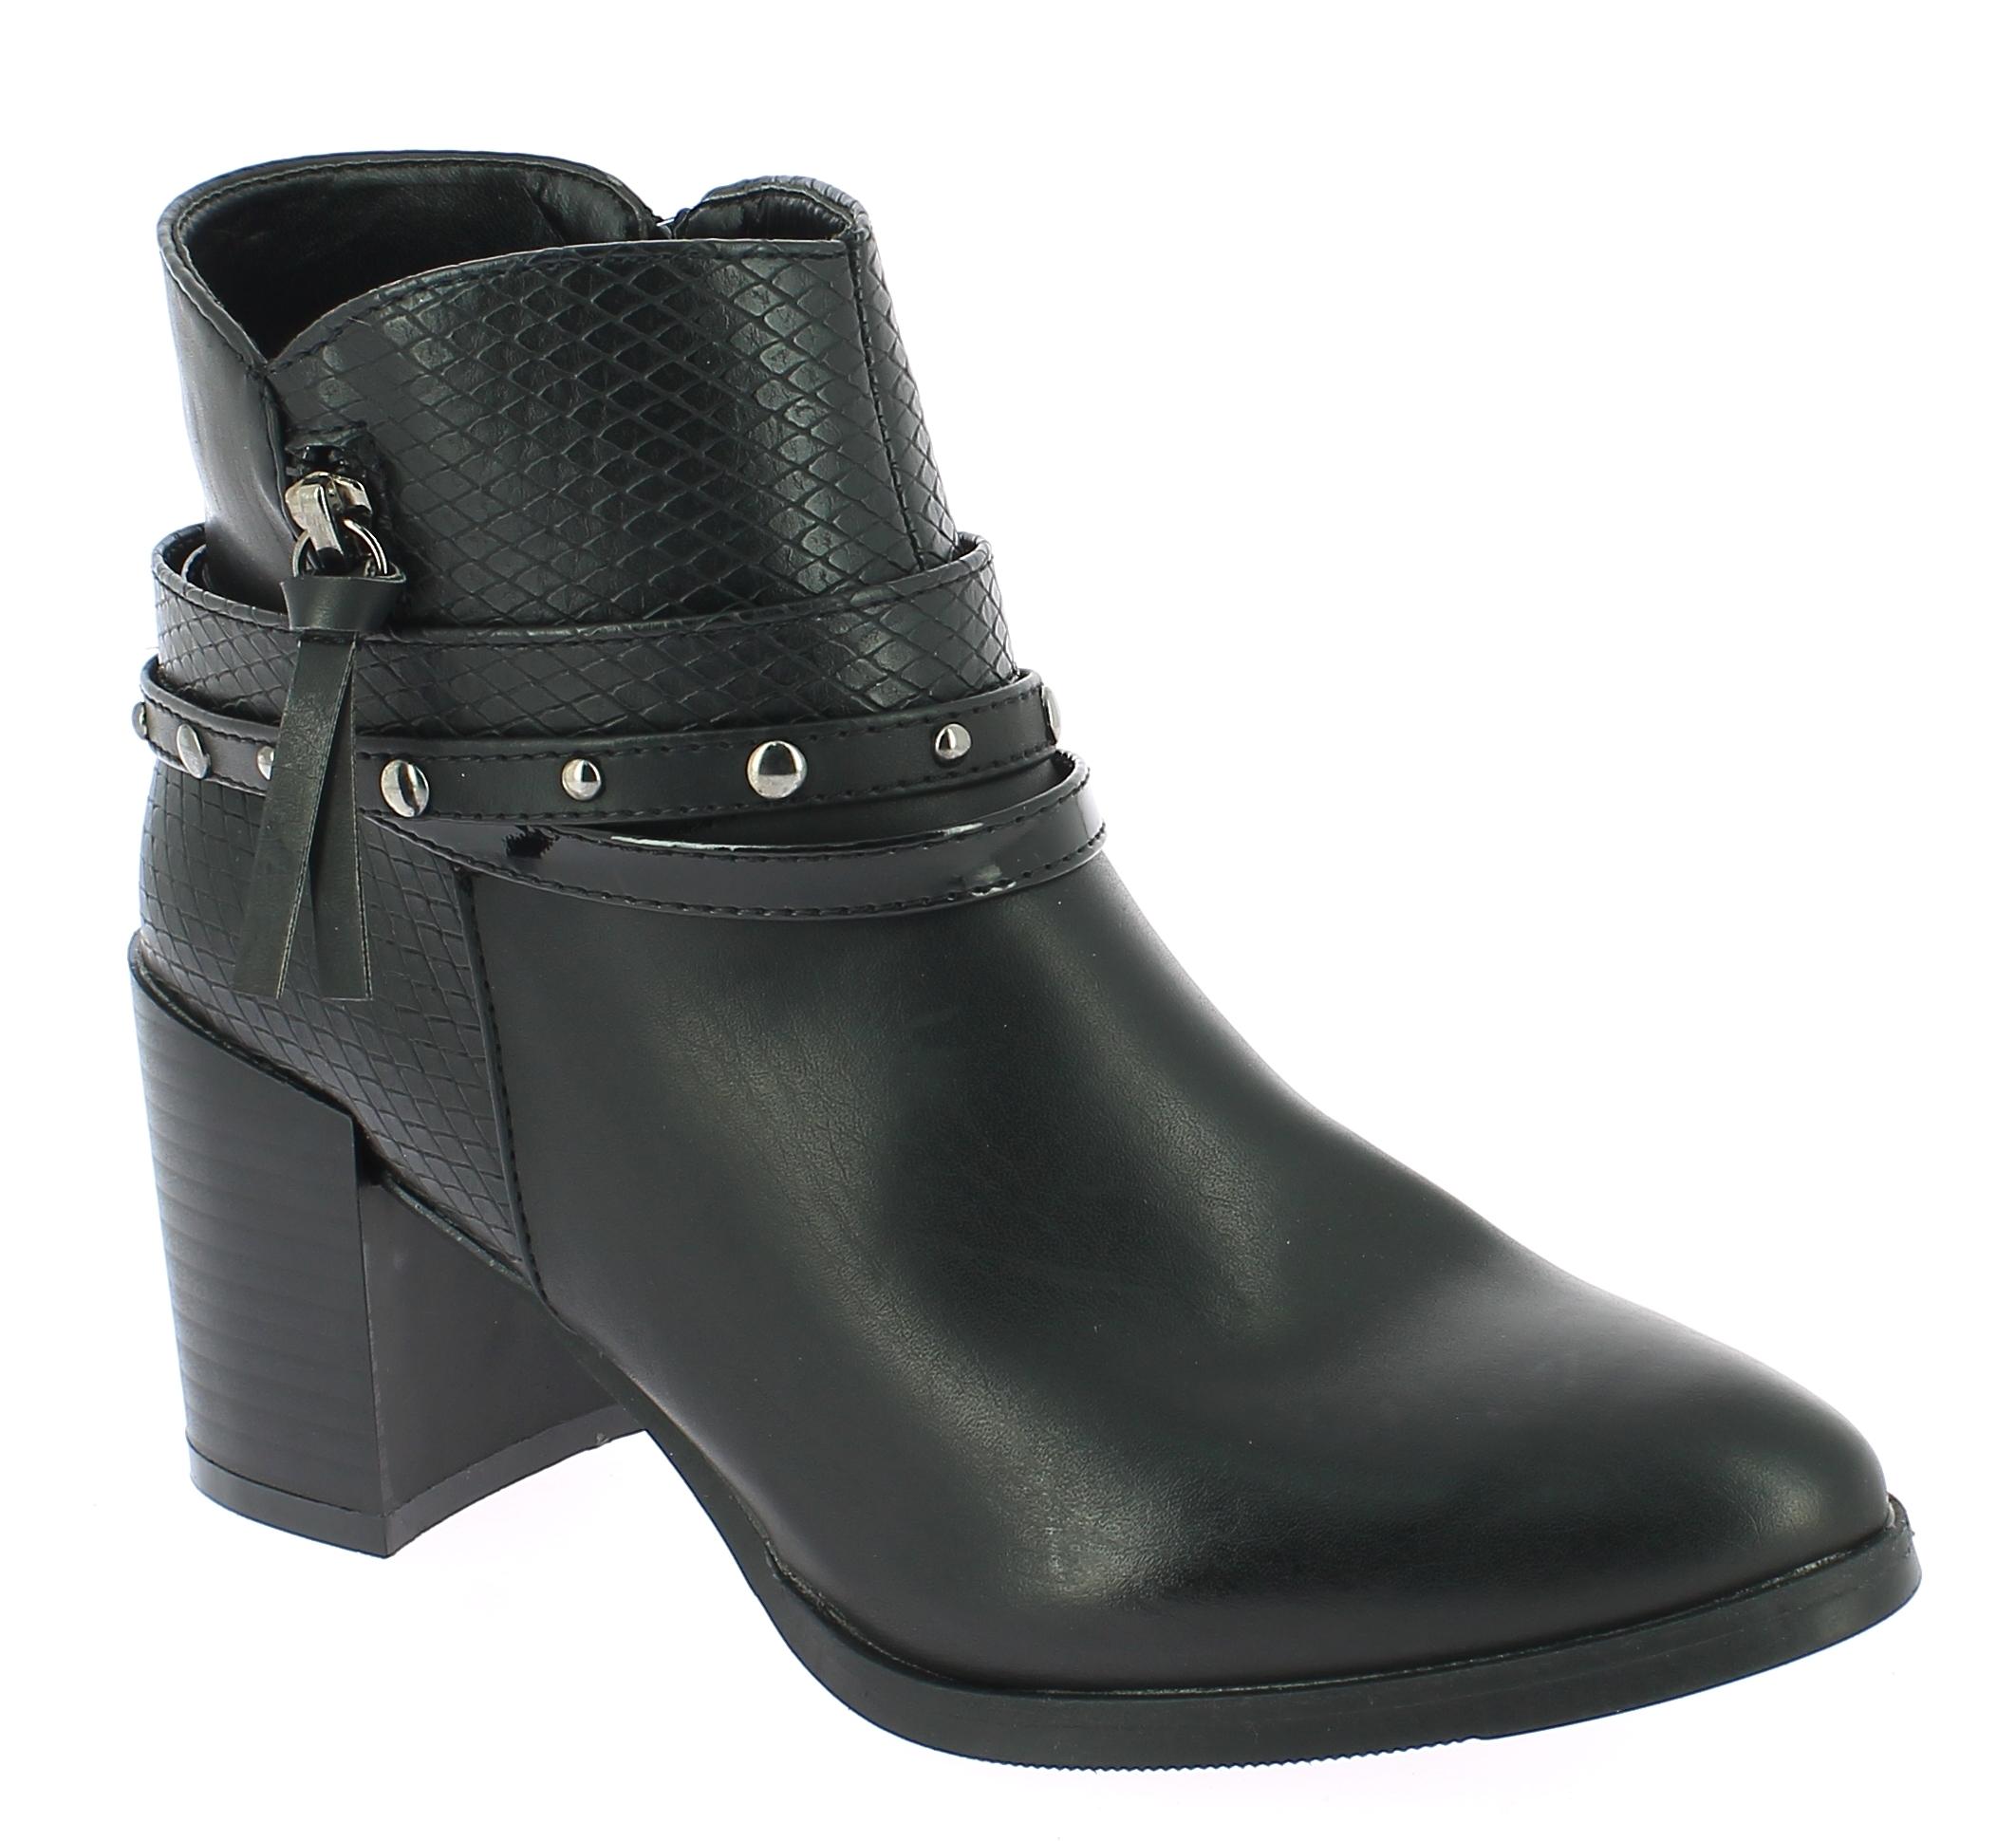 TOPWAY Γυναικείο Μποτάκι B099610 Μαύρο - IqShoes - B099610 BLACK-black-37/1/15/2 παπούτσια  γυναικεία μποτάκια